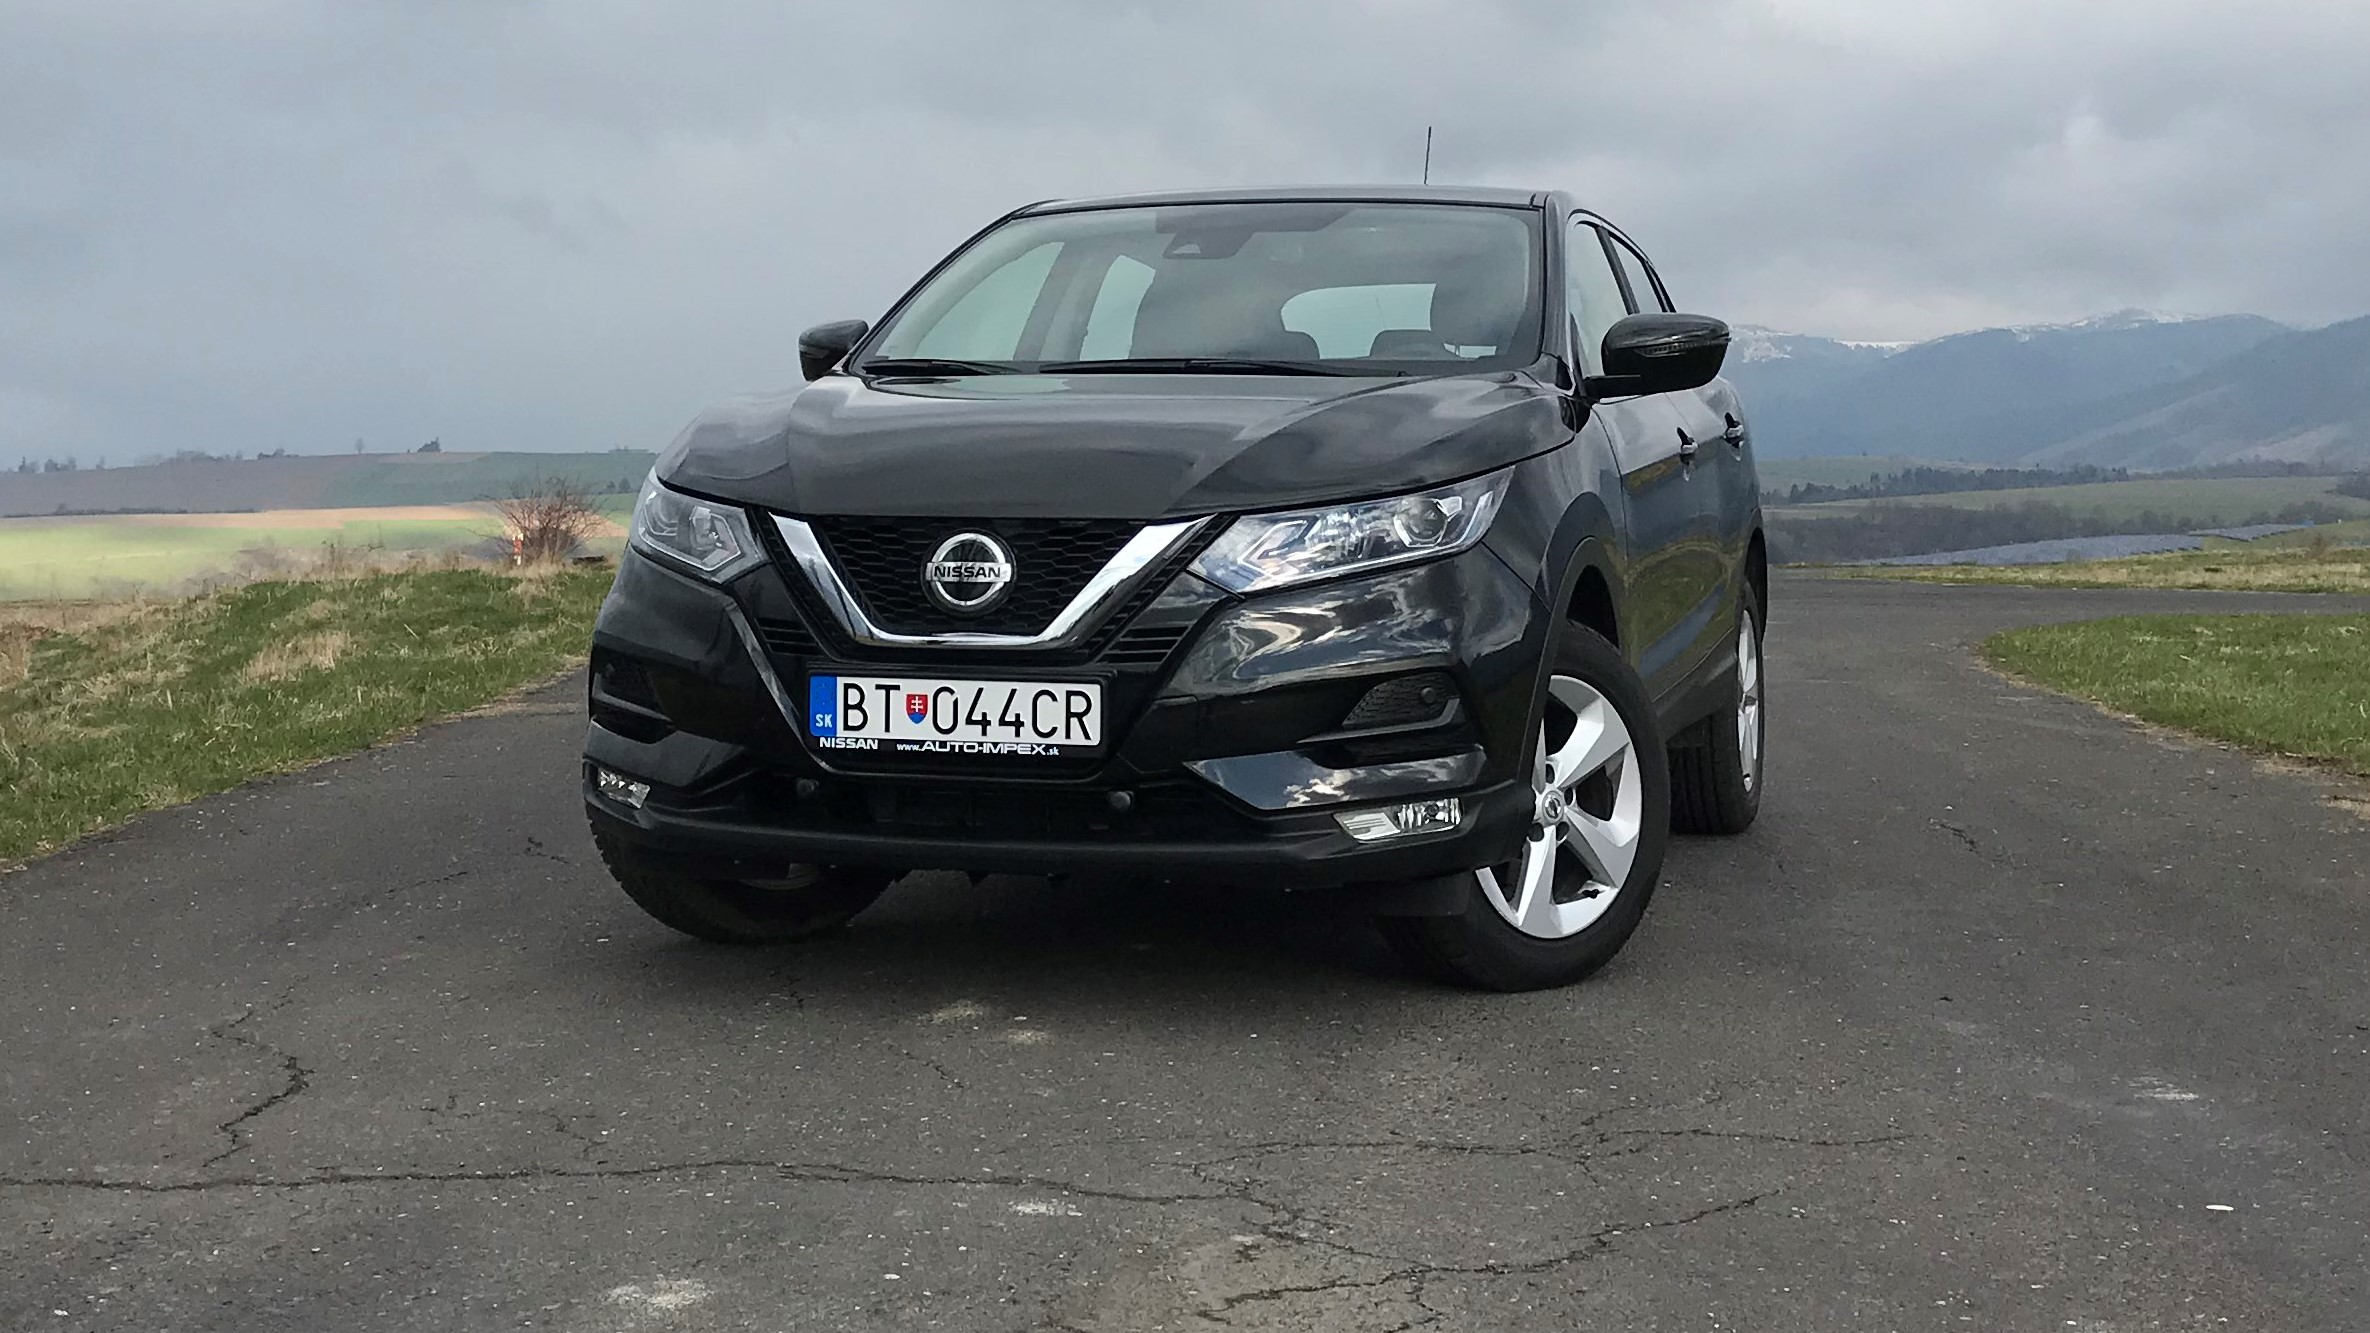 2021 Nissan Qashqai DIG-T 160 Comfort Edition test recenzia skúsenosti